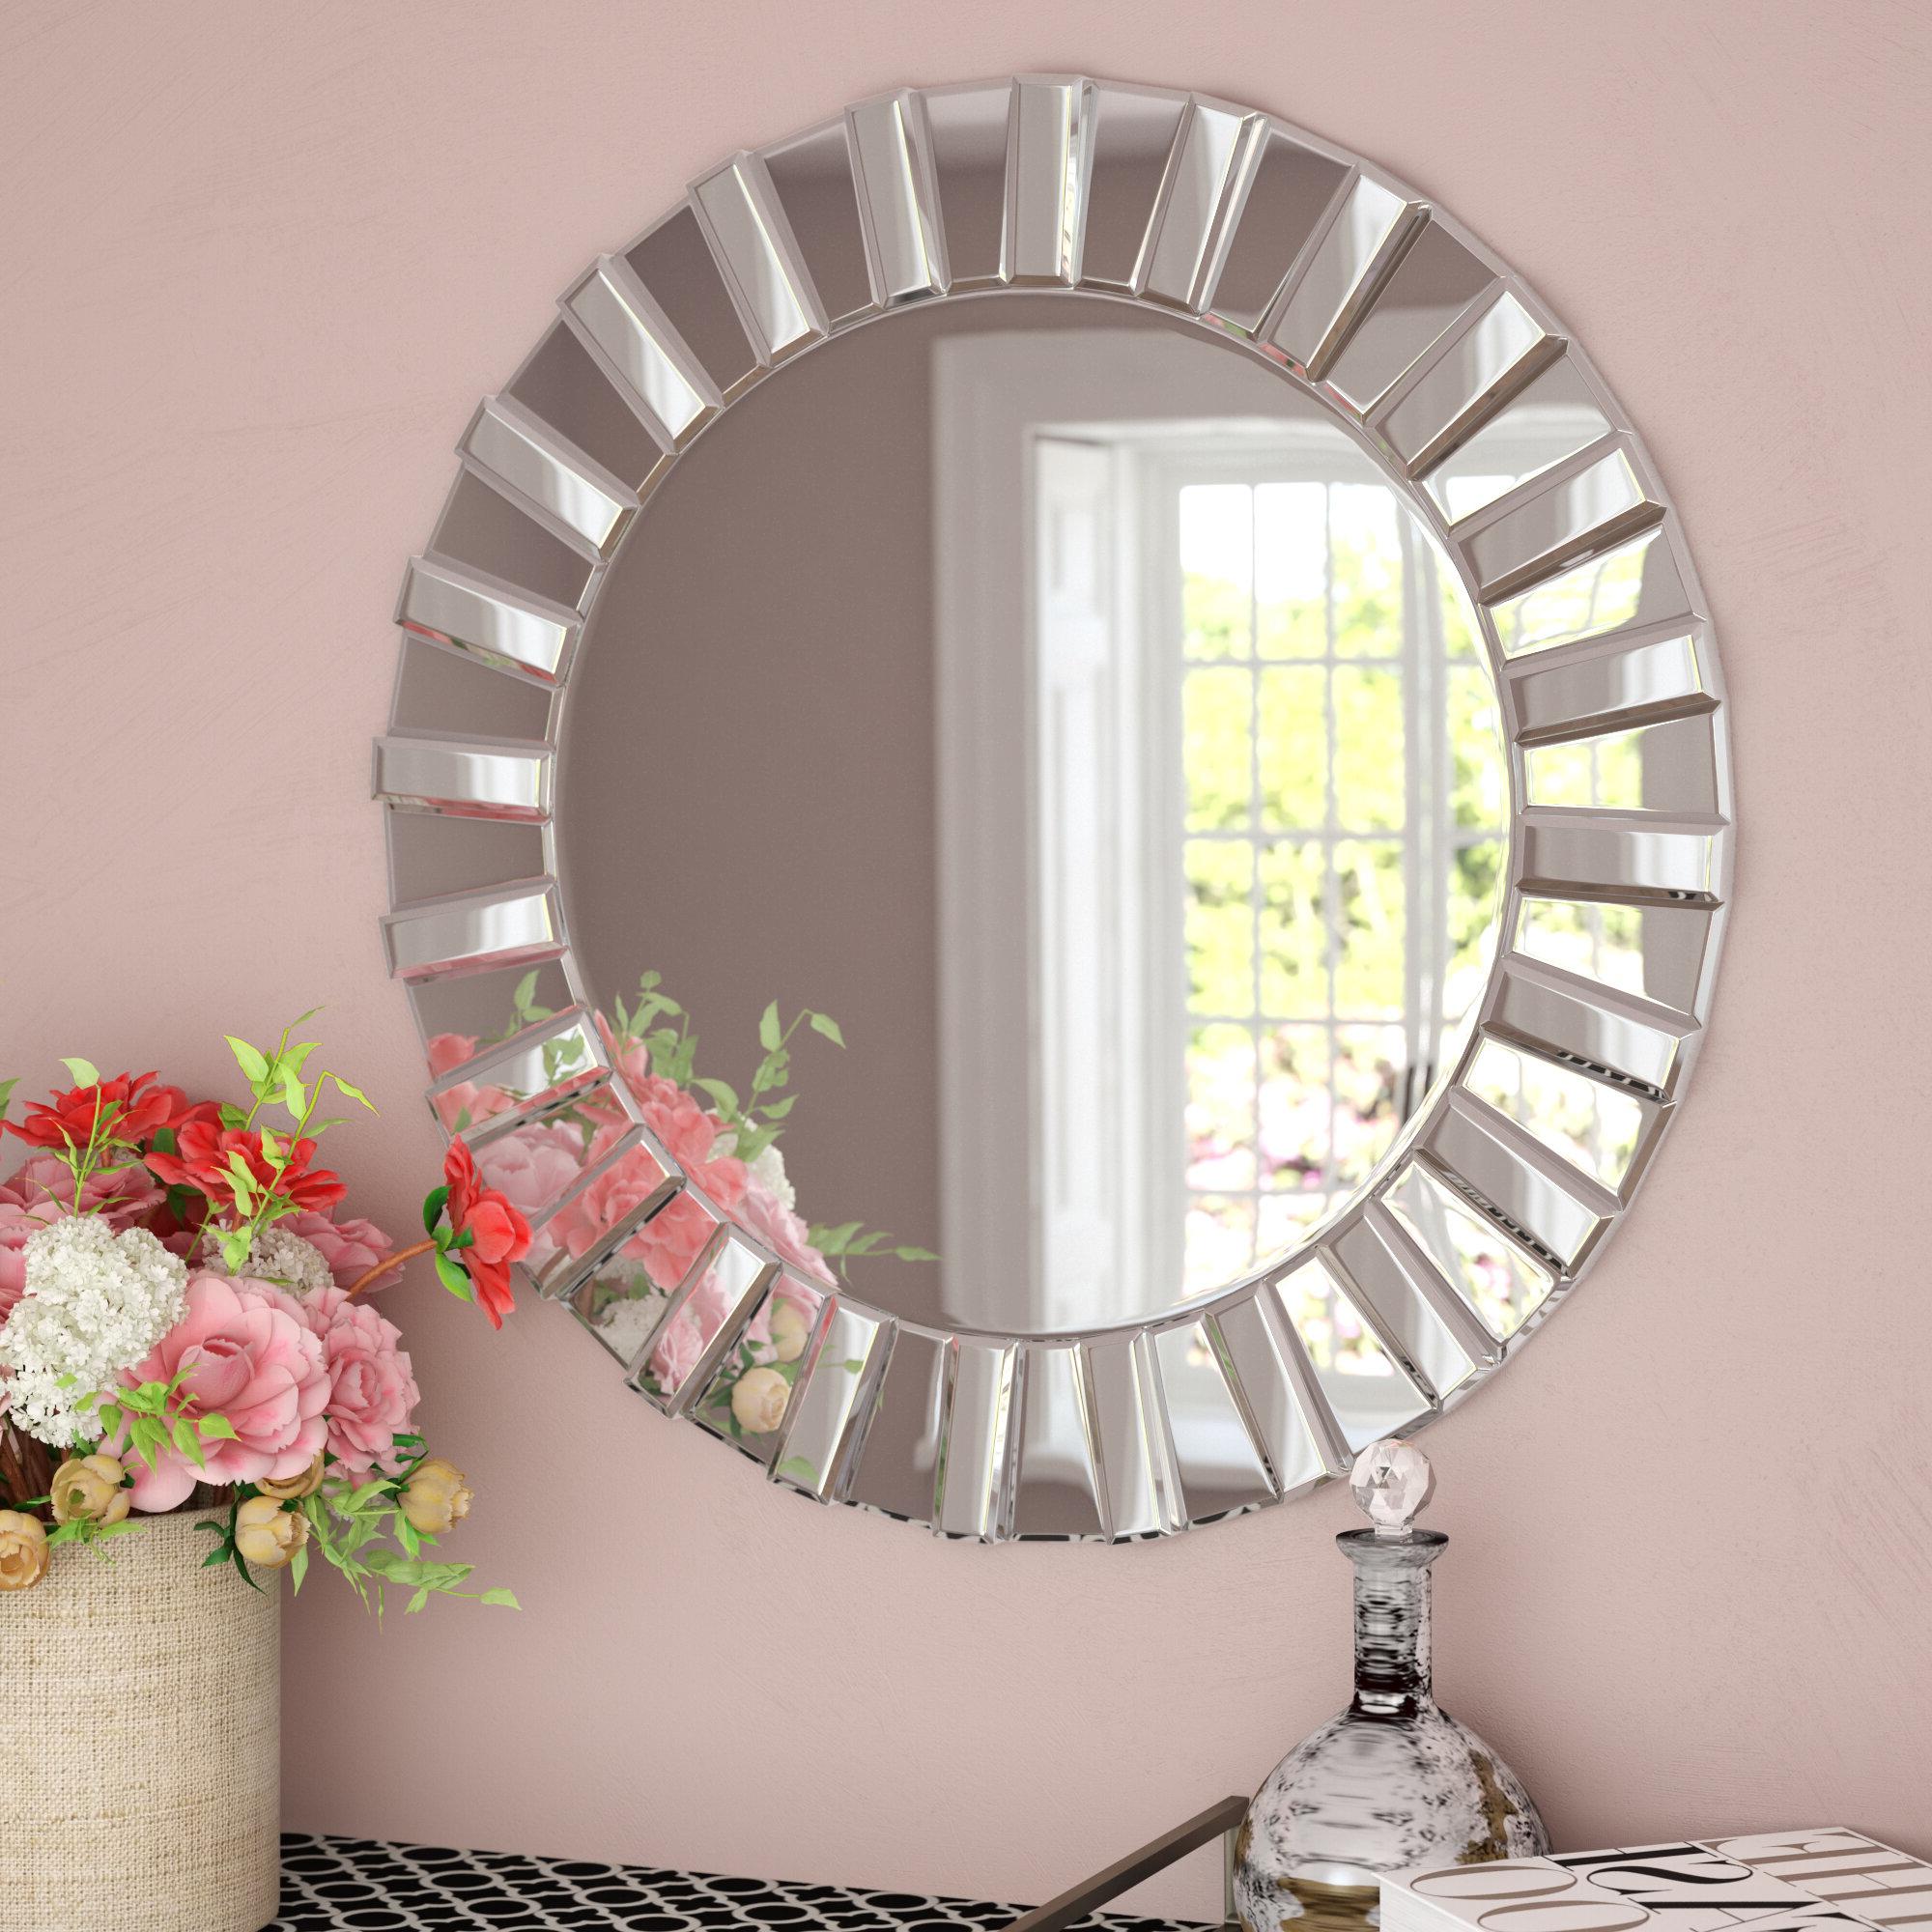 Favorite Teshia Modern & Contemporary Wall Mirror Within Lidya Frameless Beveled Wall Mirrors (View 6 of 20)